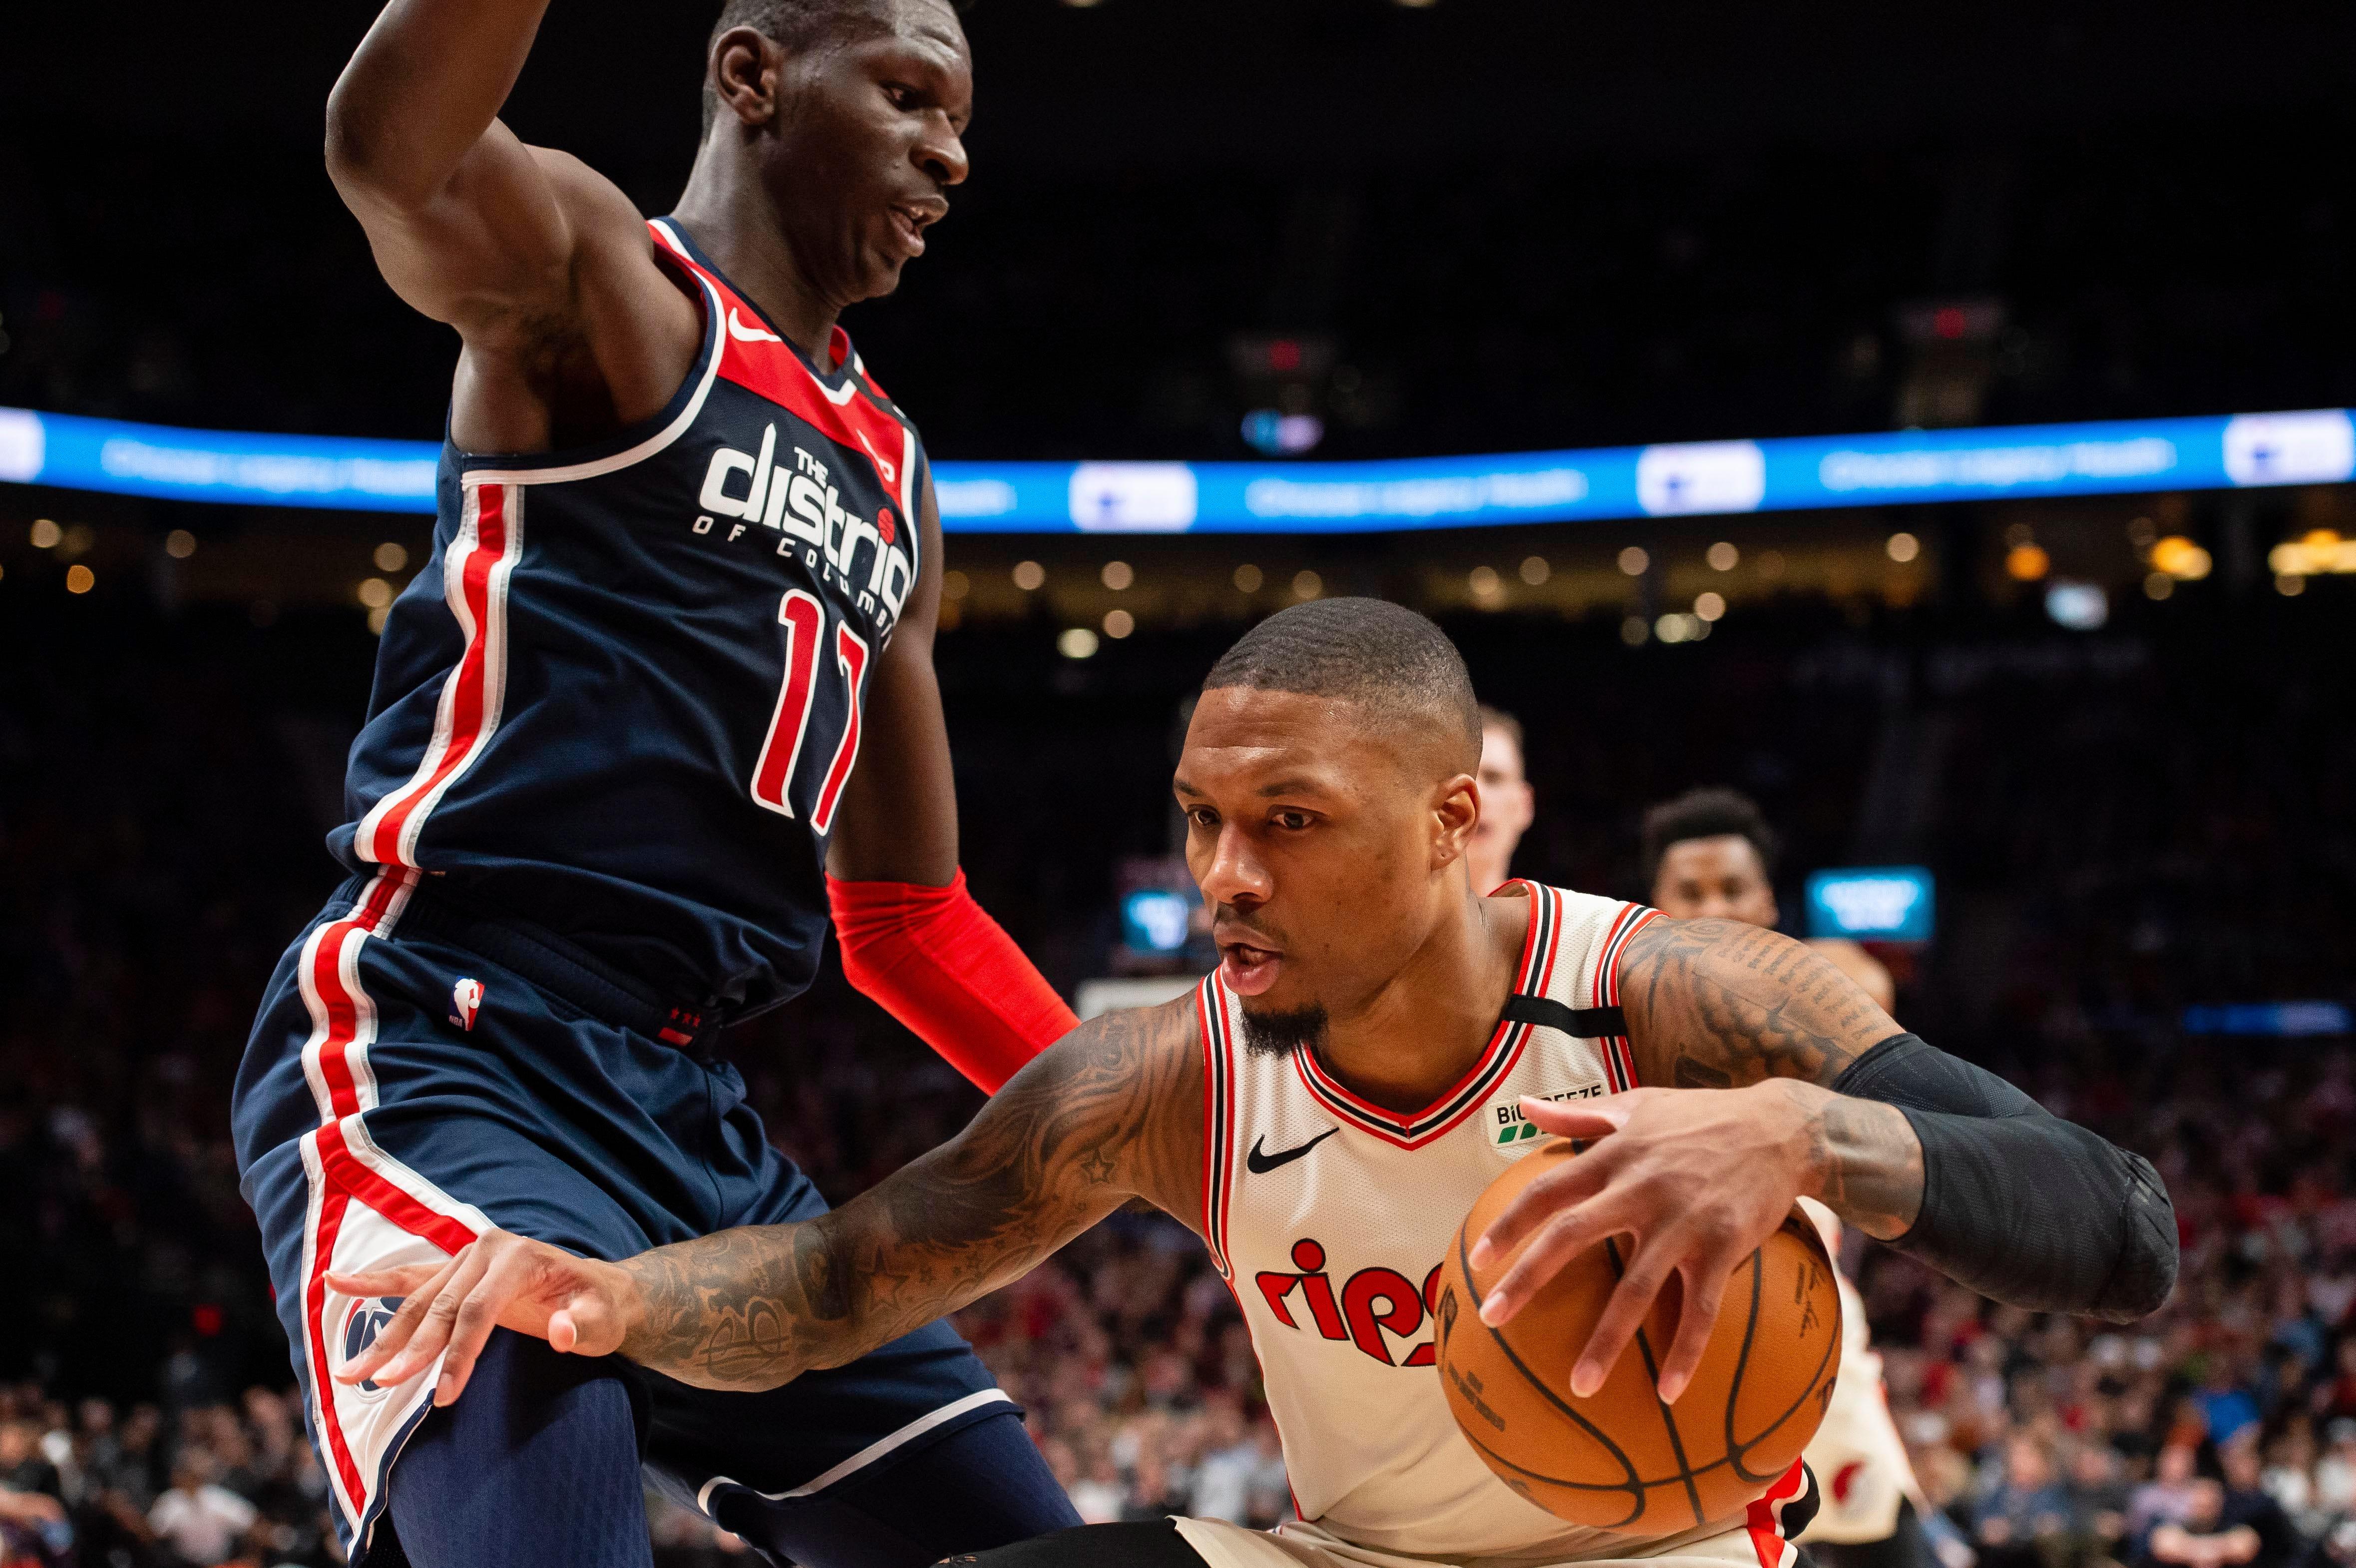 Trail Blazers' Damian Lillard says he won't play if NBA teams aren't given fair shot at playoffs